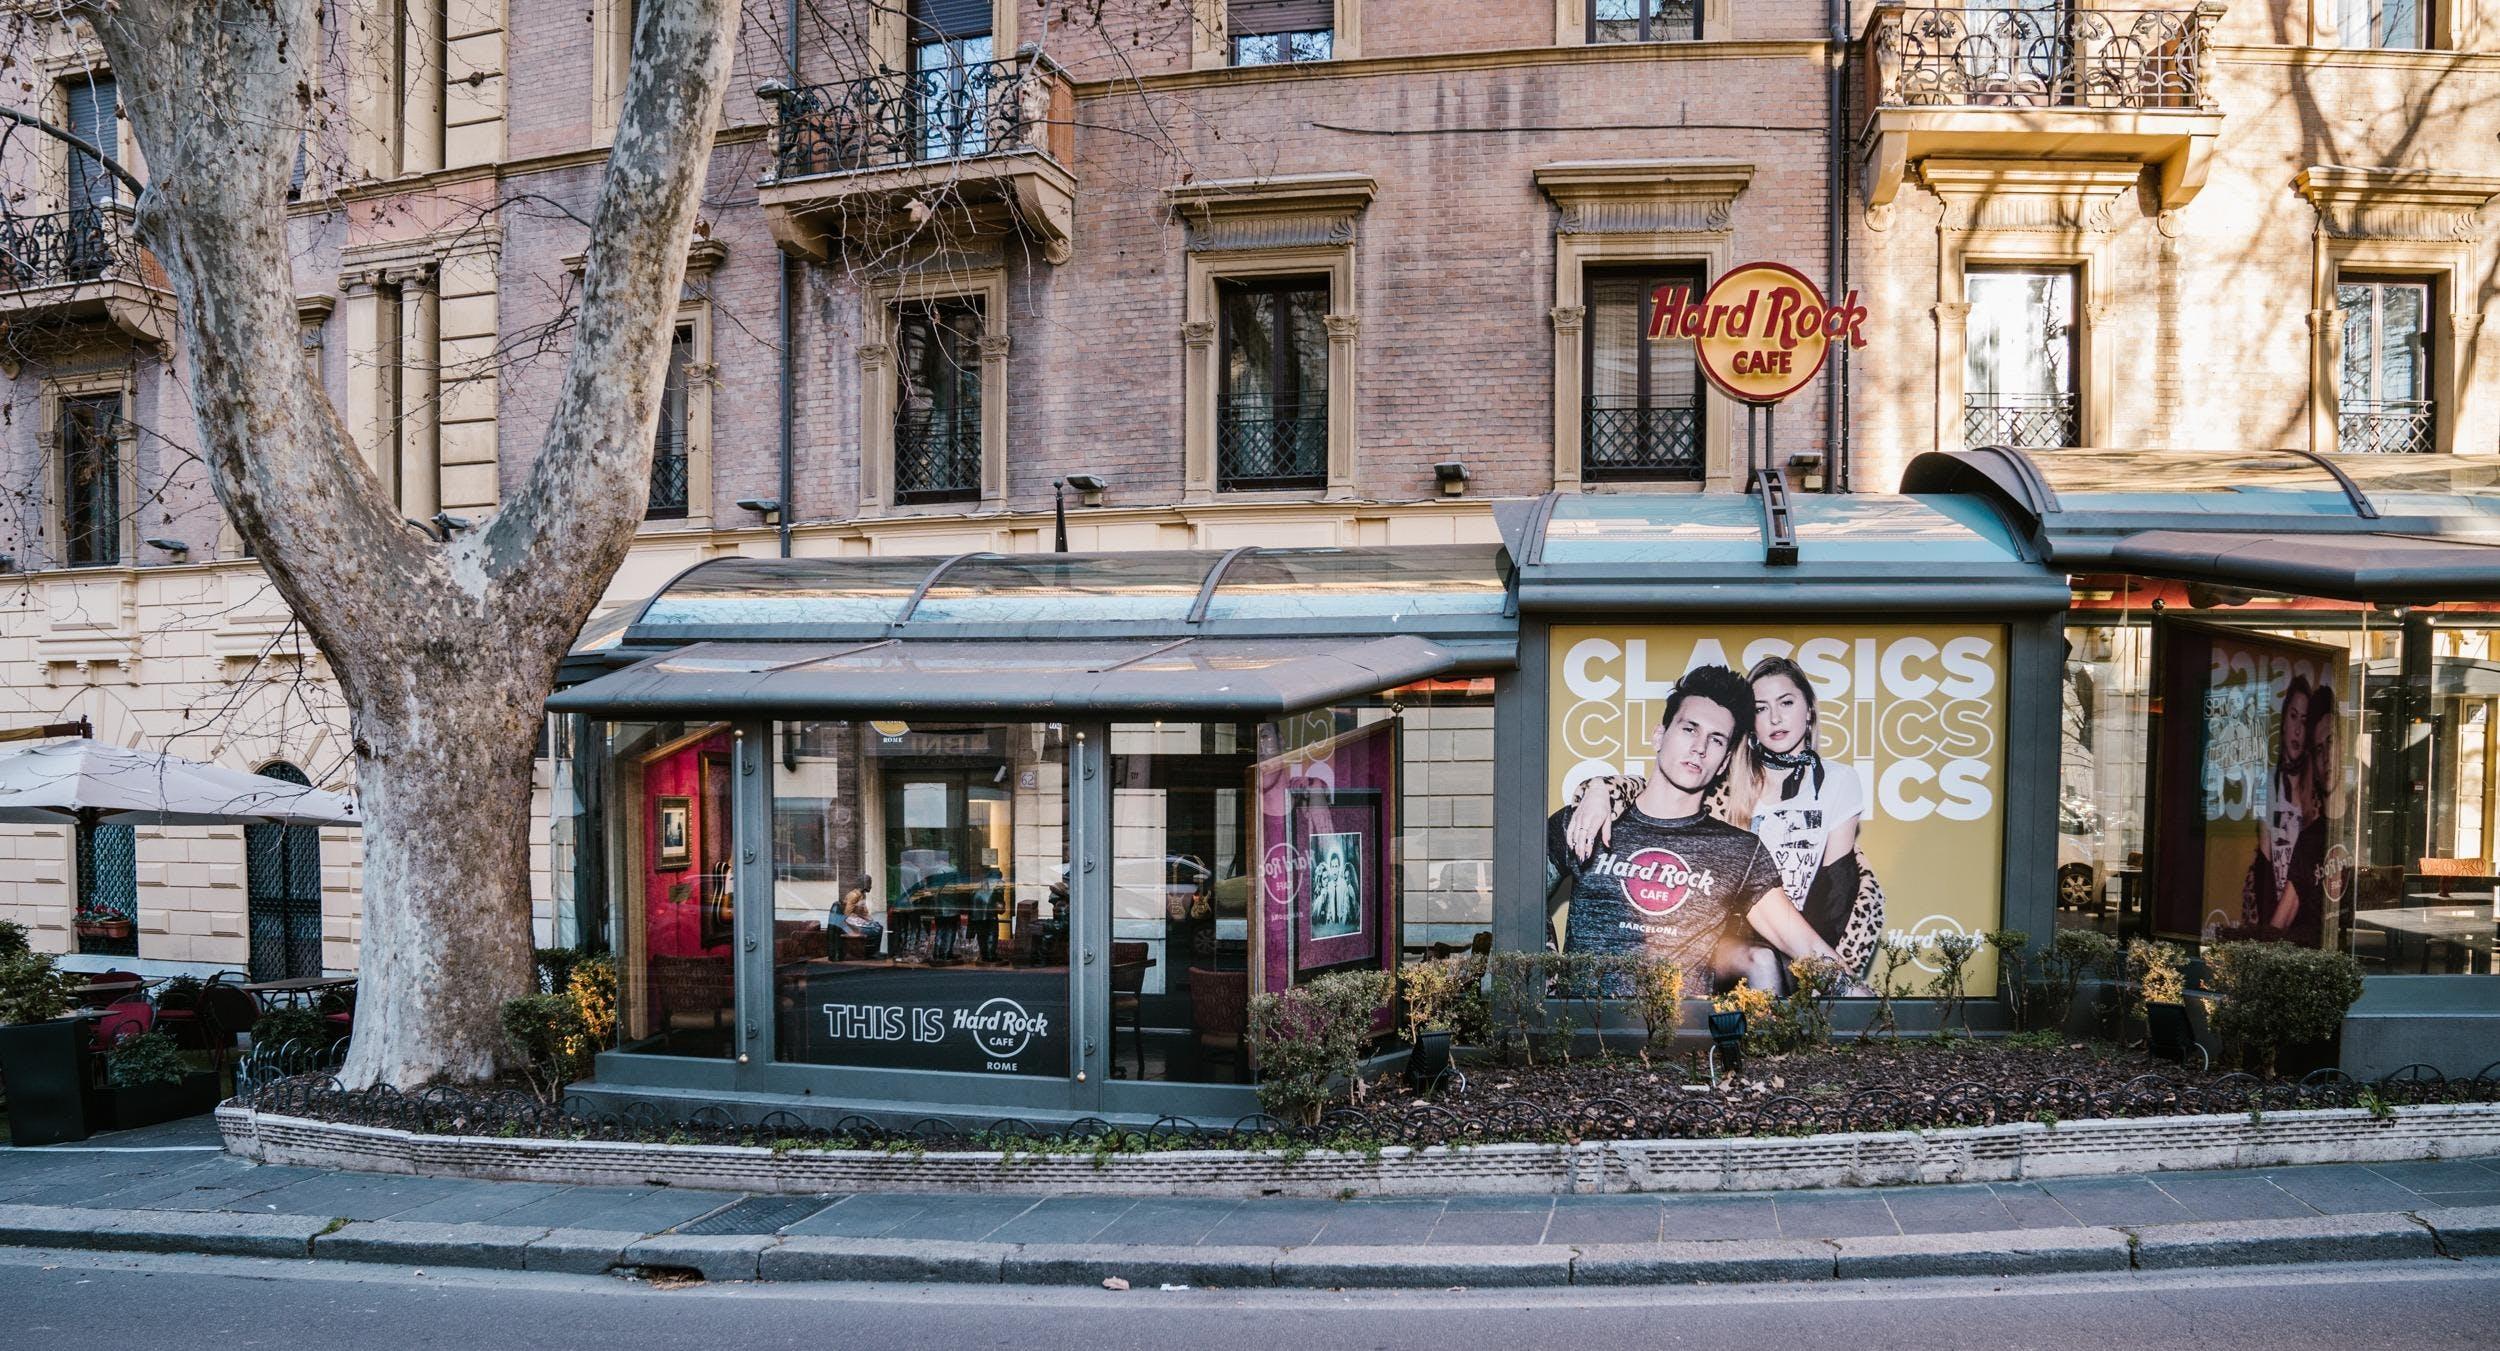 Hard Rock Cafe Rome